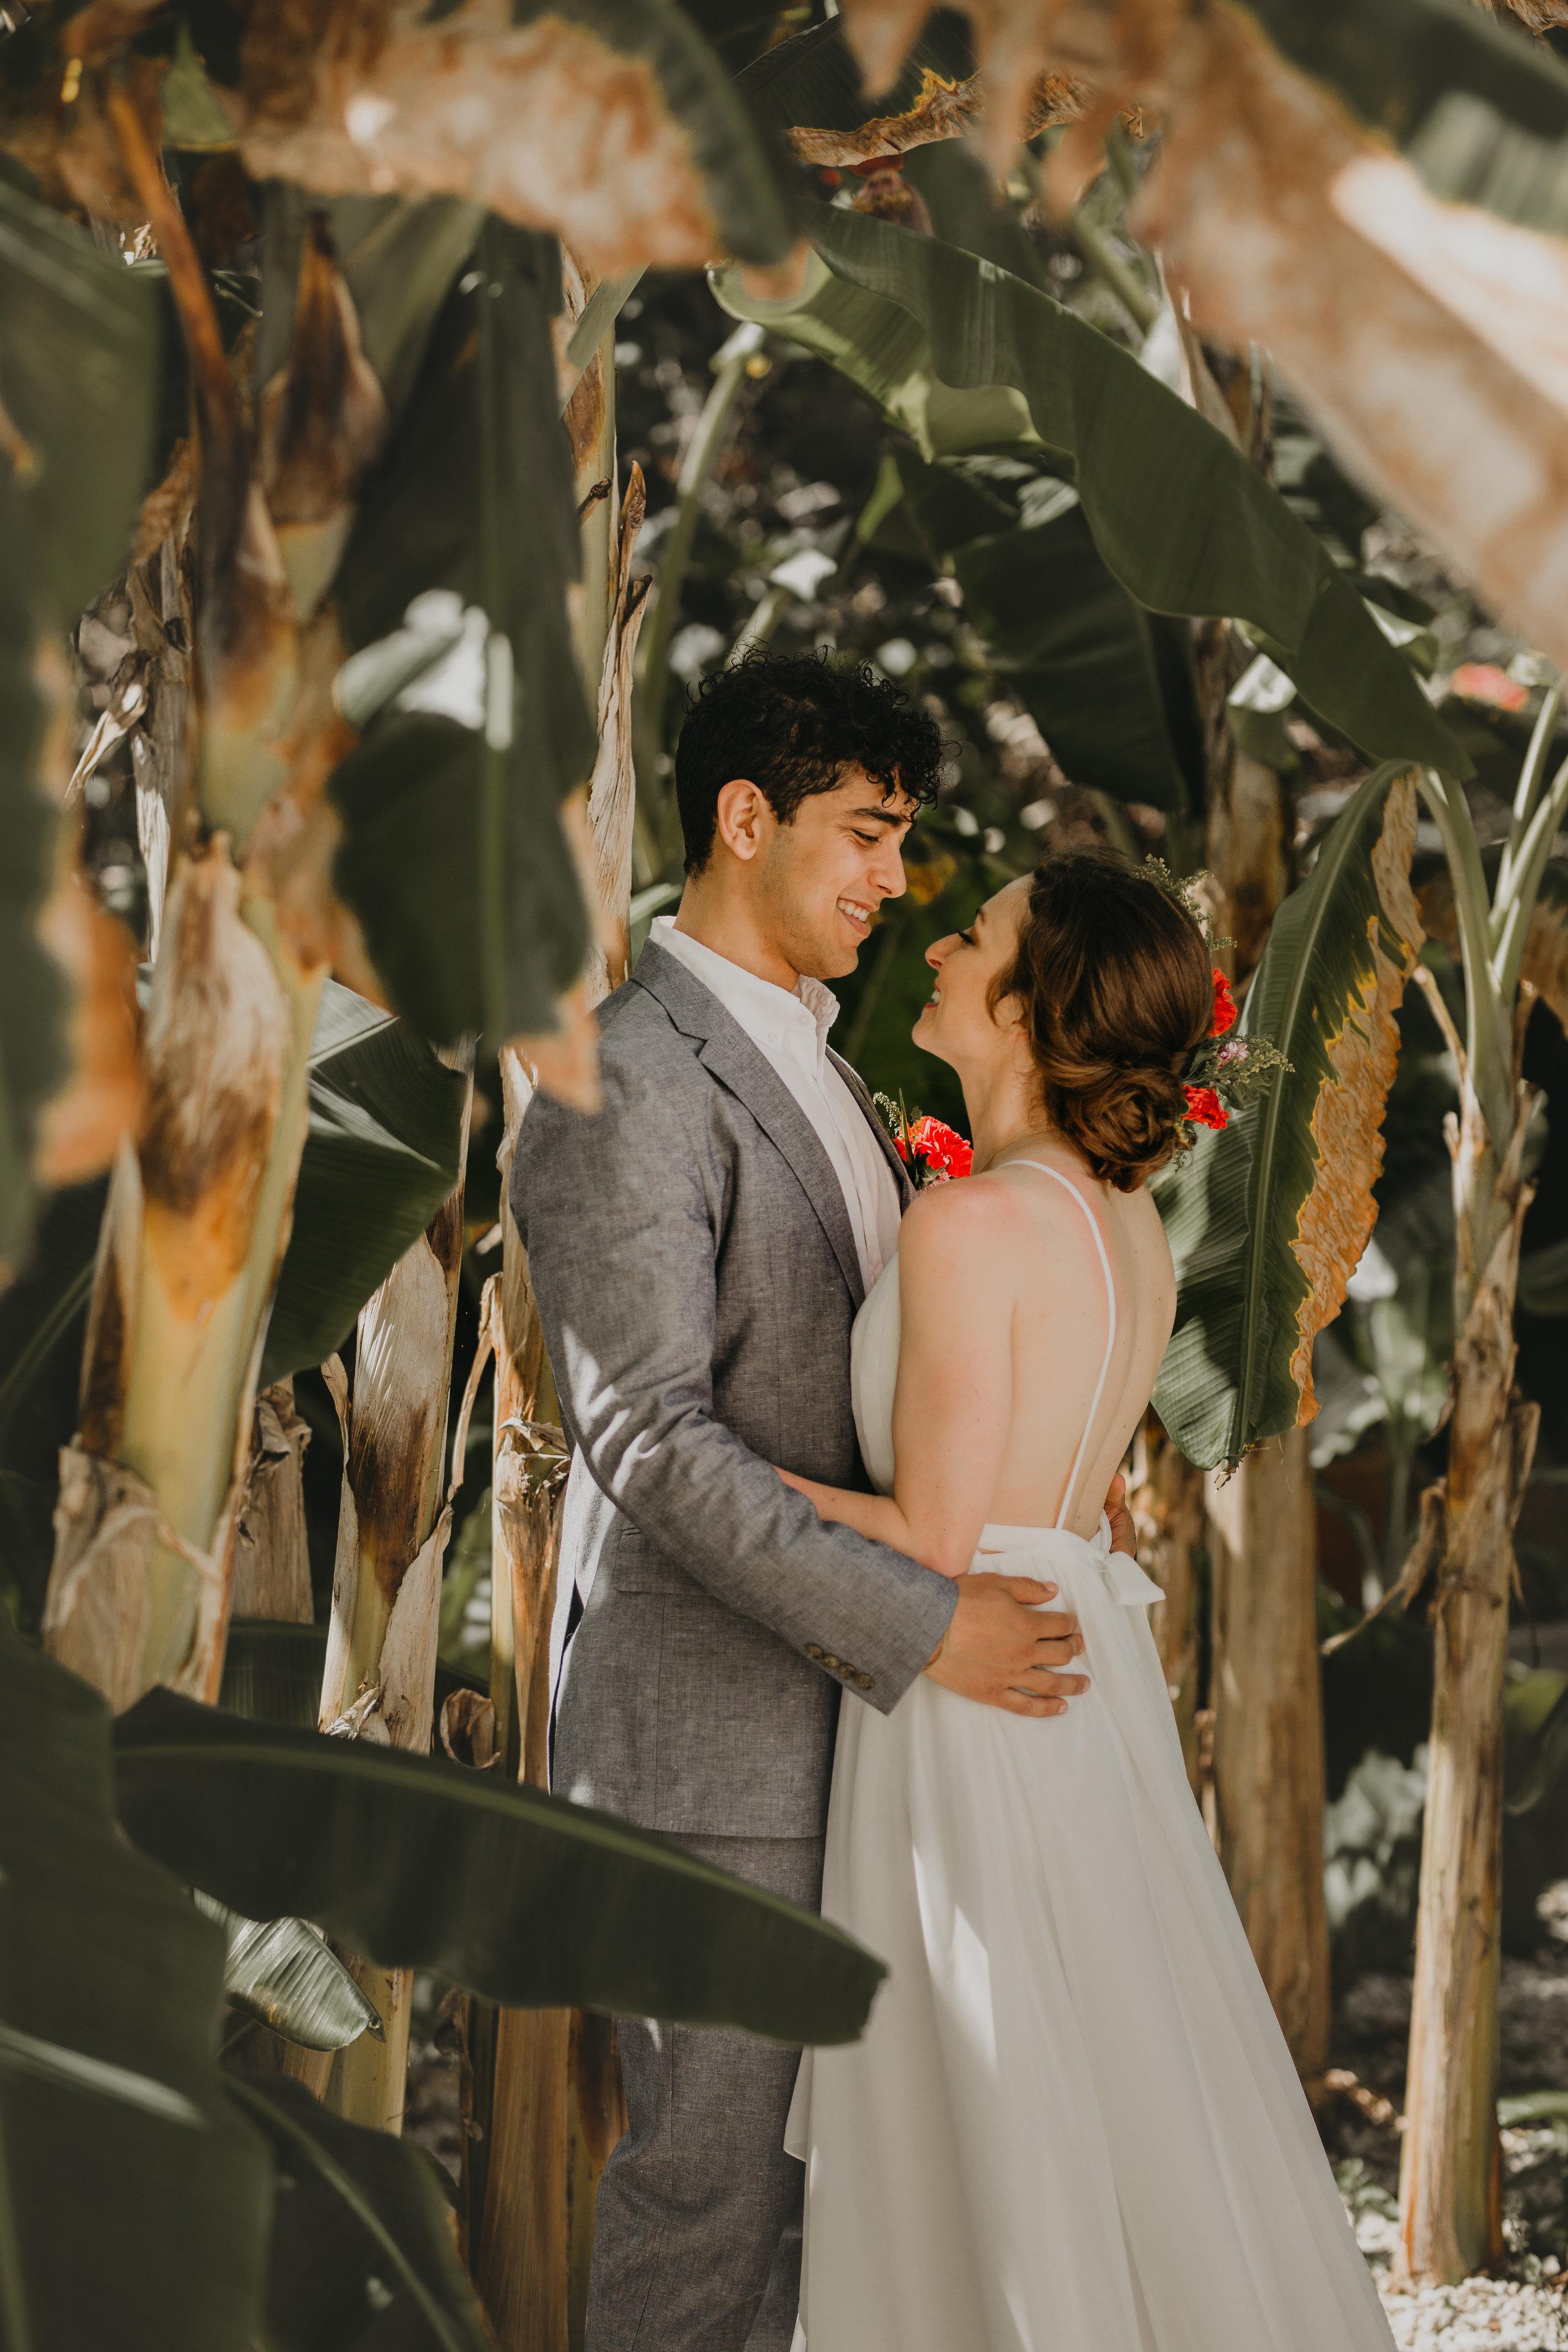 Nicole-Daacke-Photography-beachfront-akumal-destionation-wedding-tulum-mexico-elopement-photographer-destination-wedding-inspiration-sunset-champagne-pop-boho-bride-ocean-tropical-bohemian-tulum-wedding-photos-109.jpg